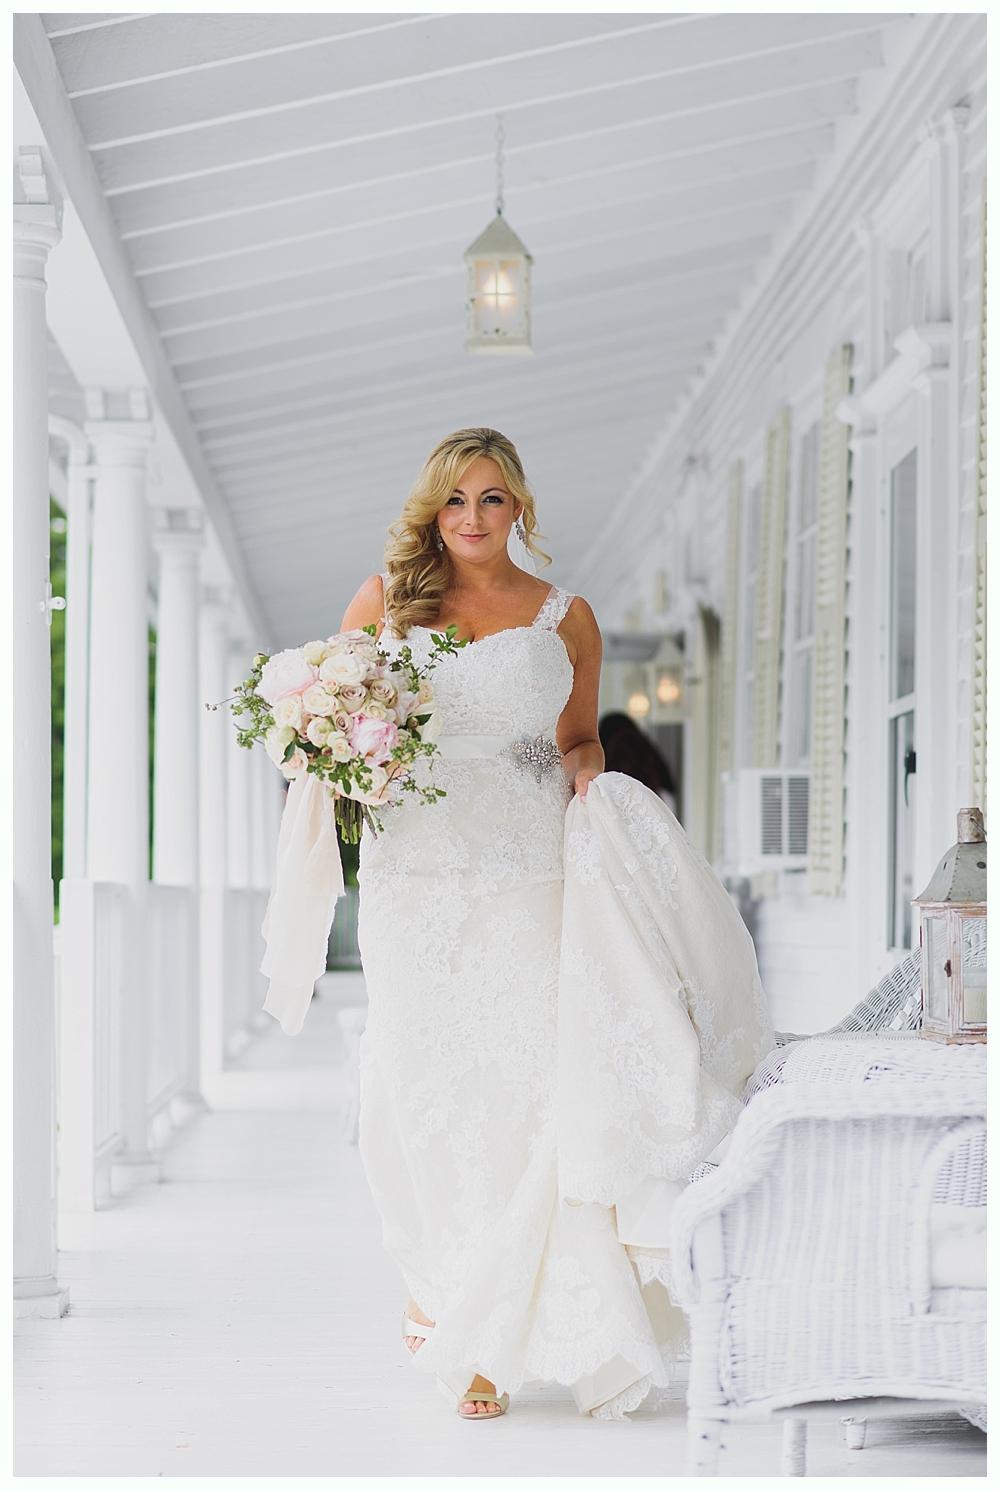 Lord_Thompson_Manor_Wedding_Photography_Luke_Wayne_08